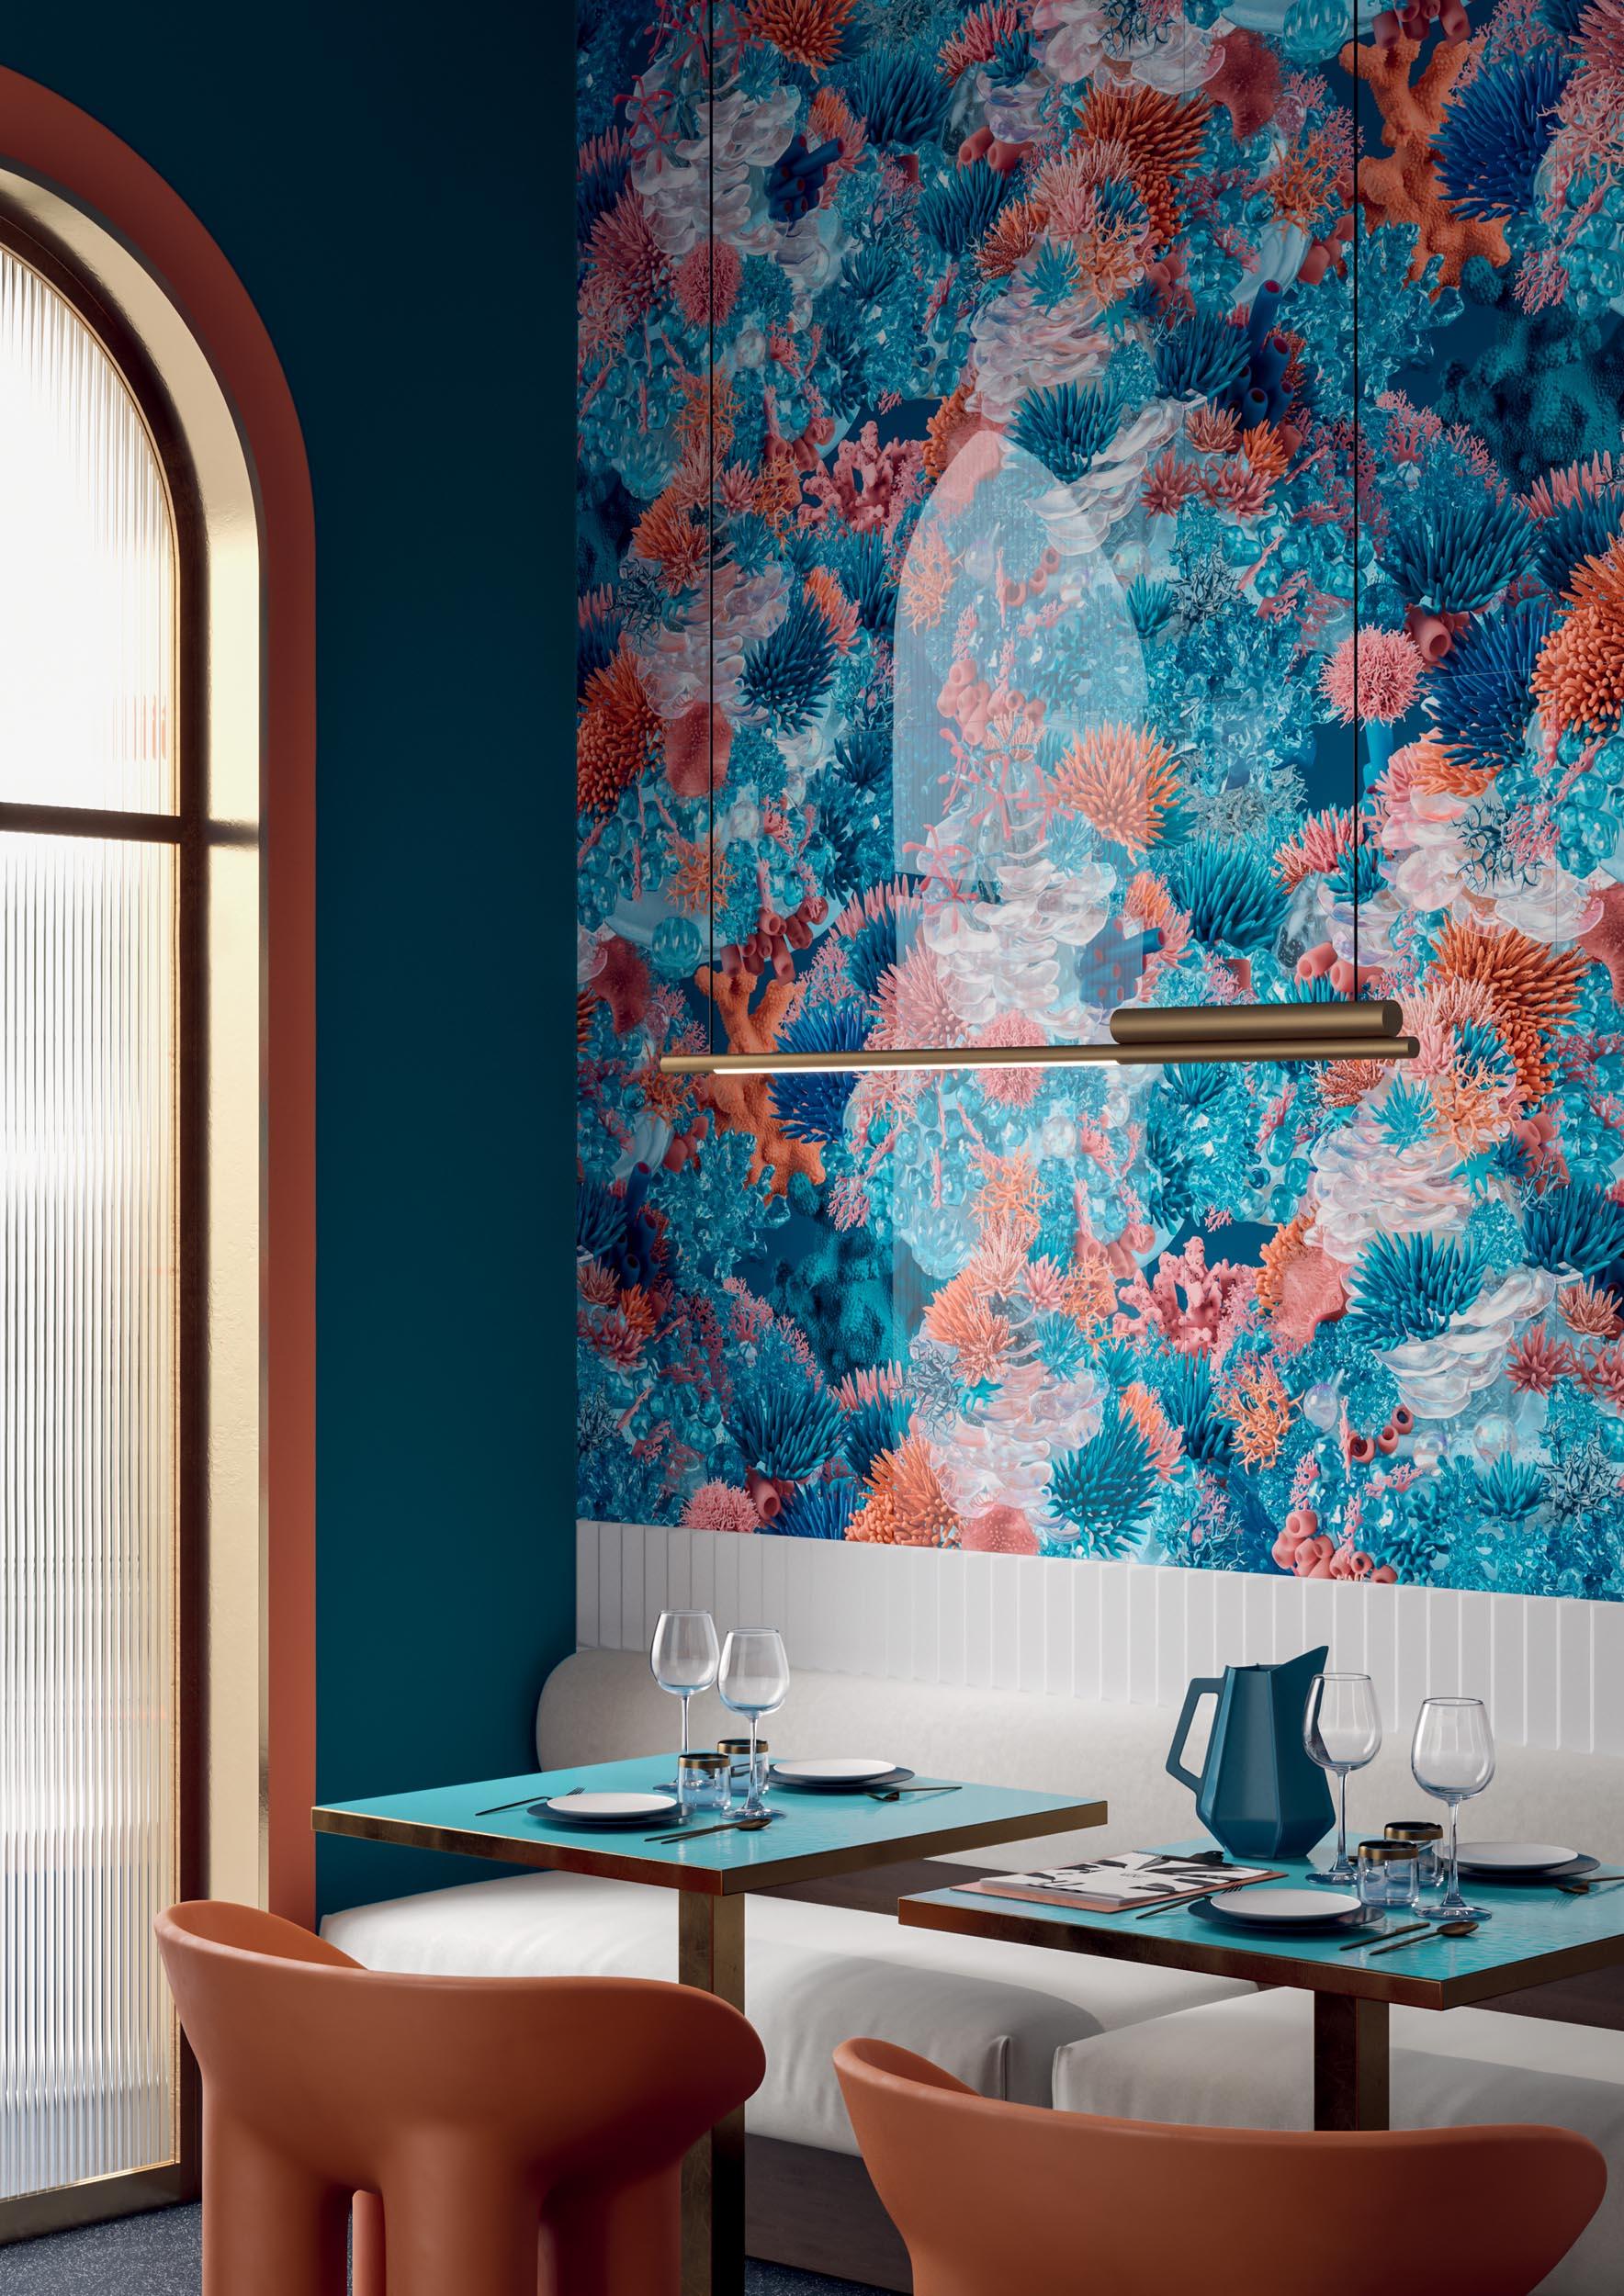 "Wall Paper41 Lux Jacques 60x120 24""x48"" / Biscuit Peak Bianco 5x20 2""x8"""